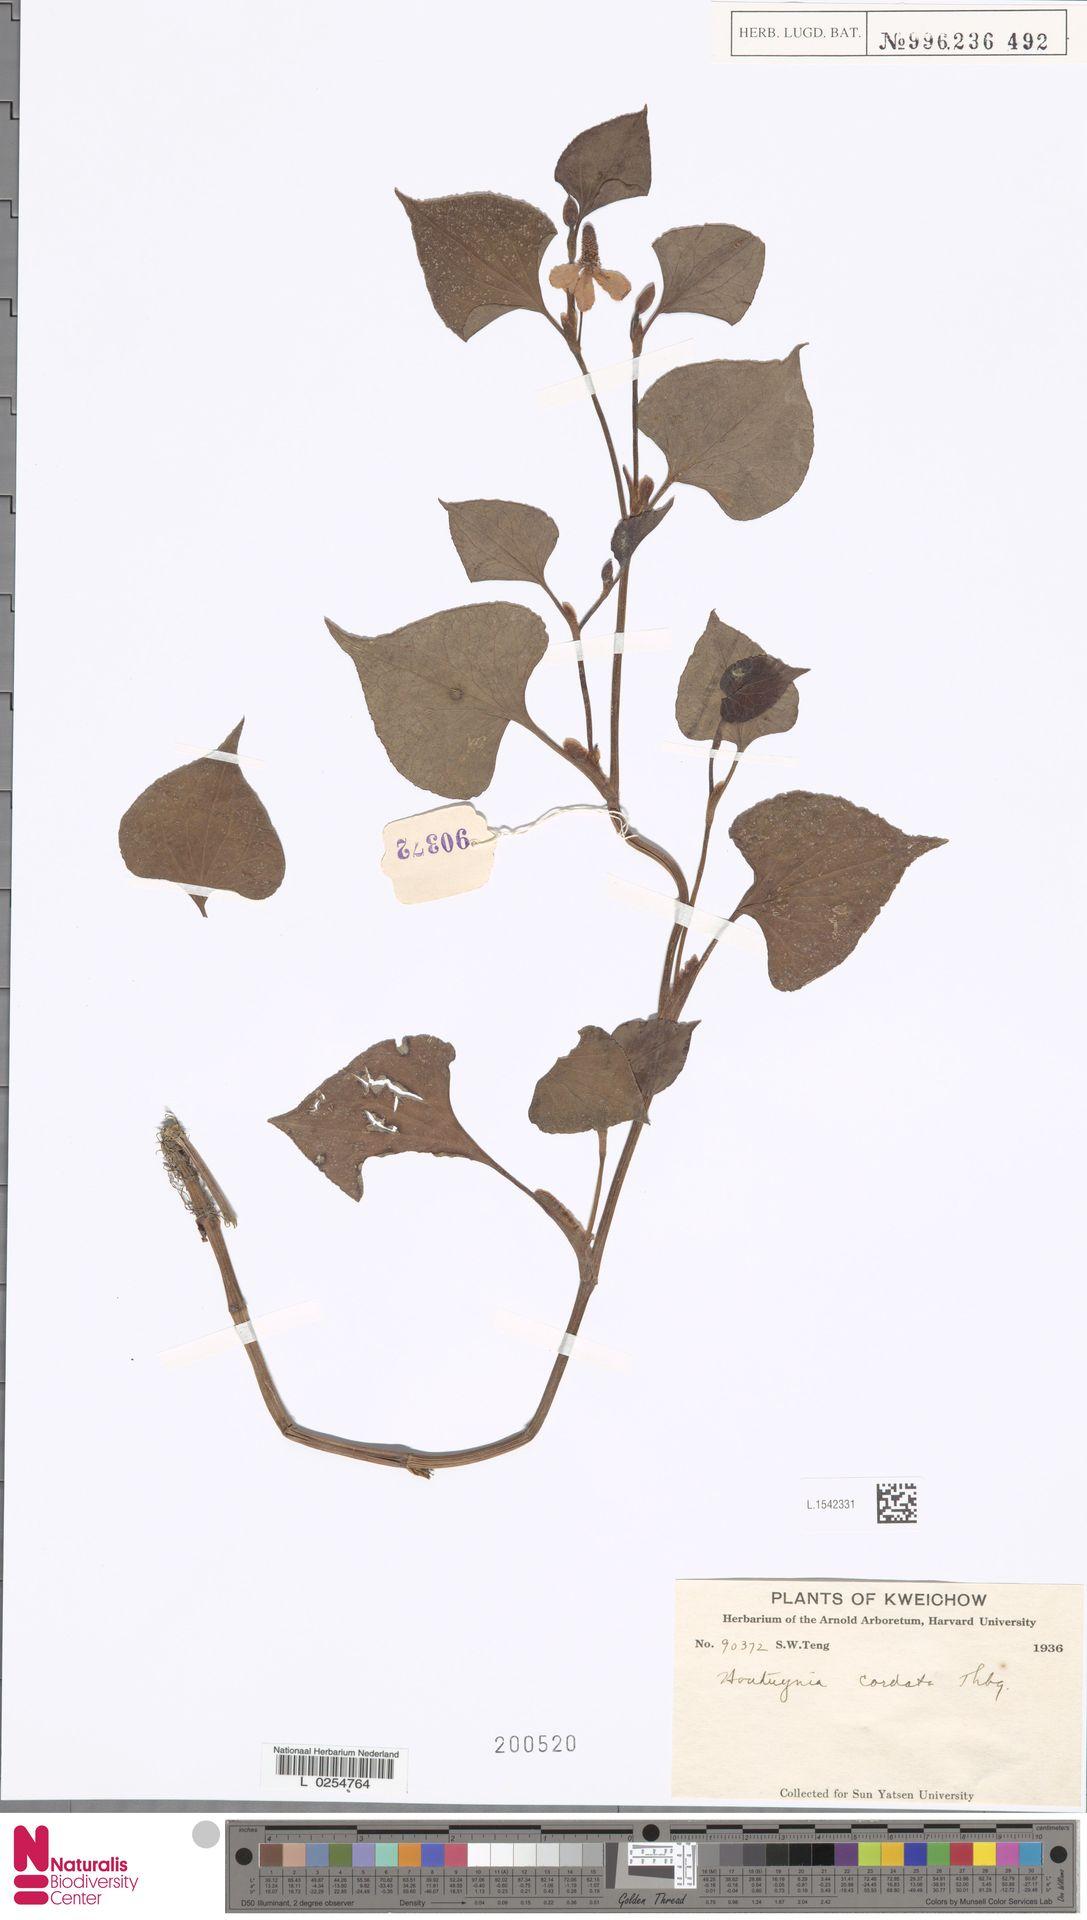 L.1542331   Houttuynia cordata Thunb.